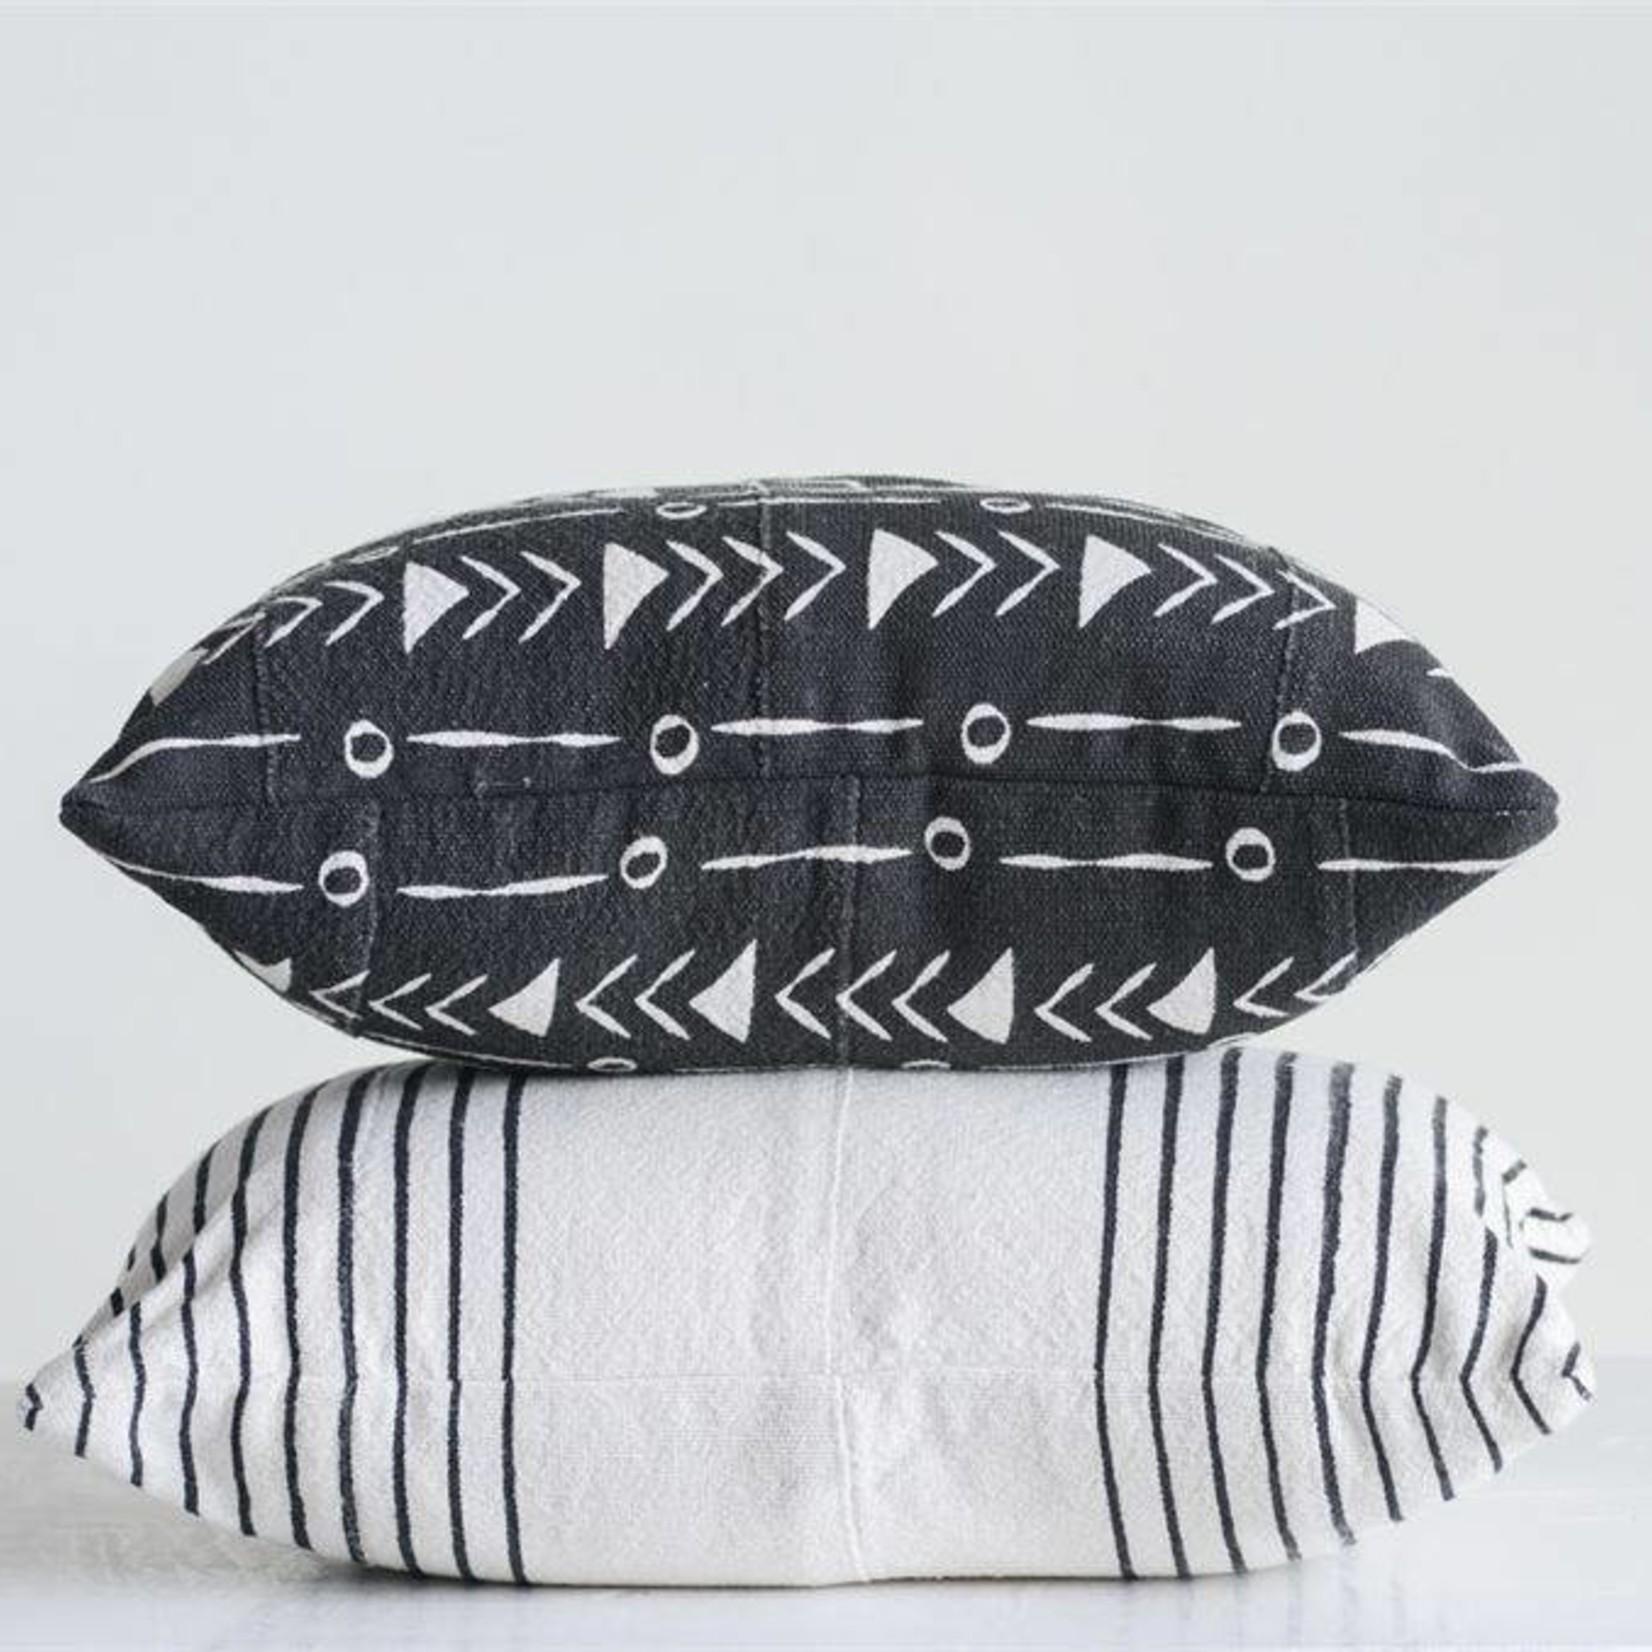 Mud Cloth Pattern Pillow - 2 Styles